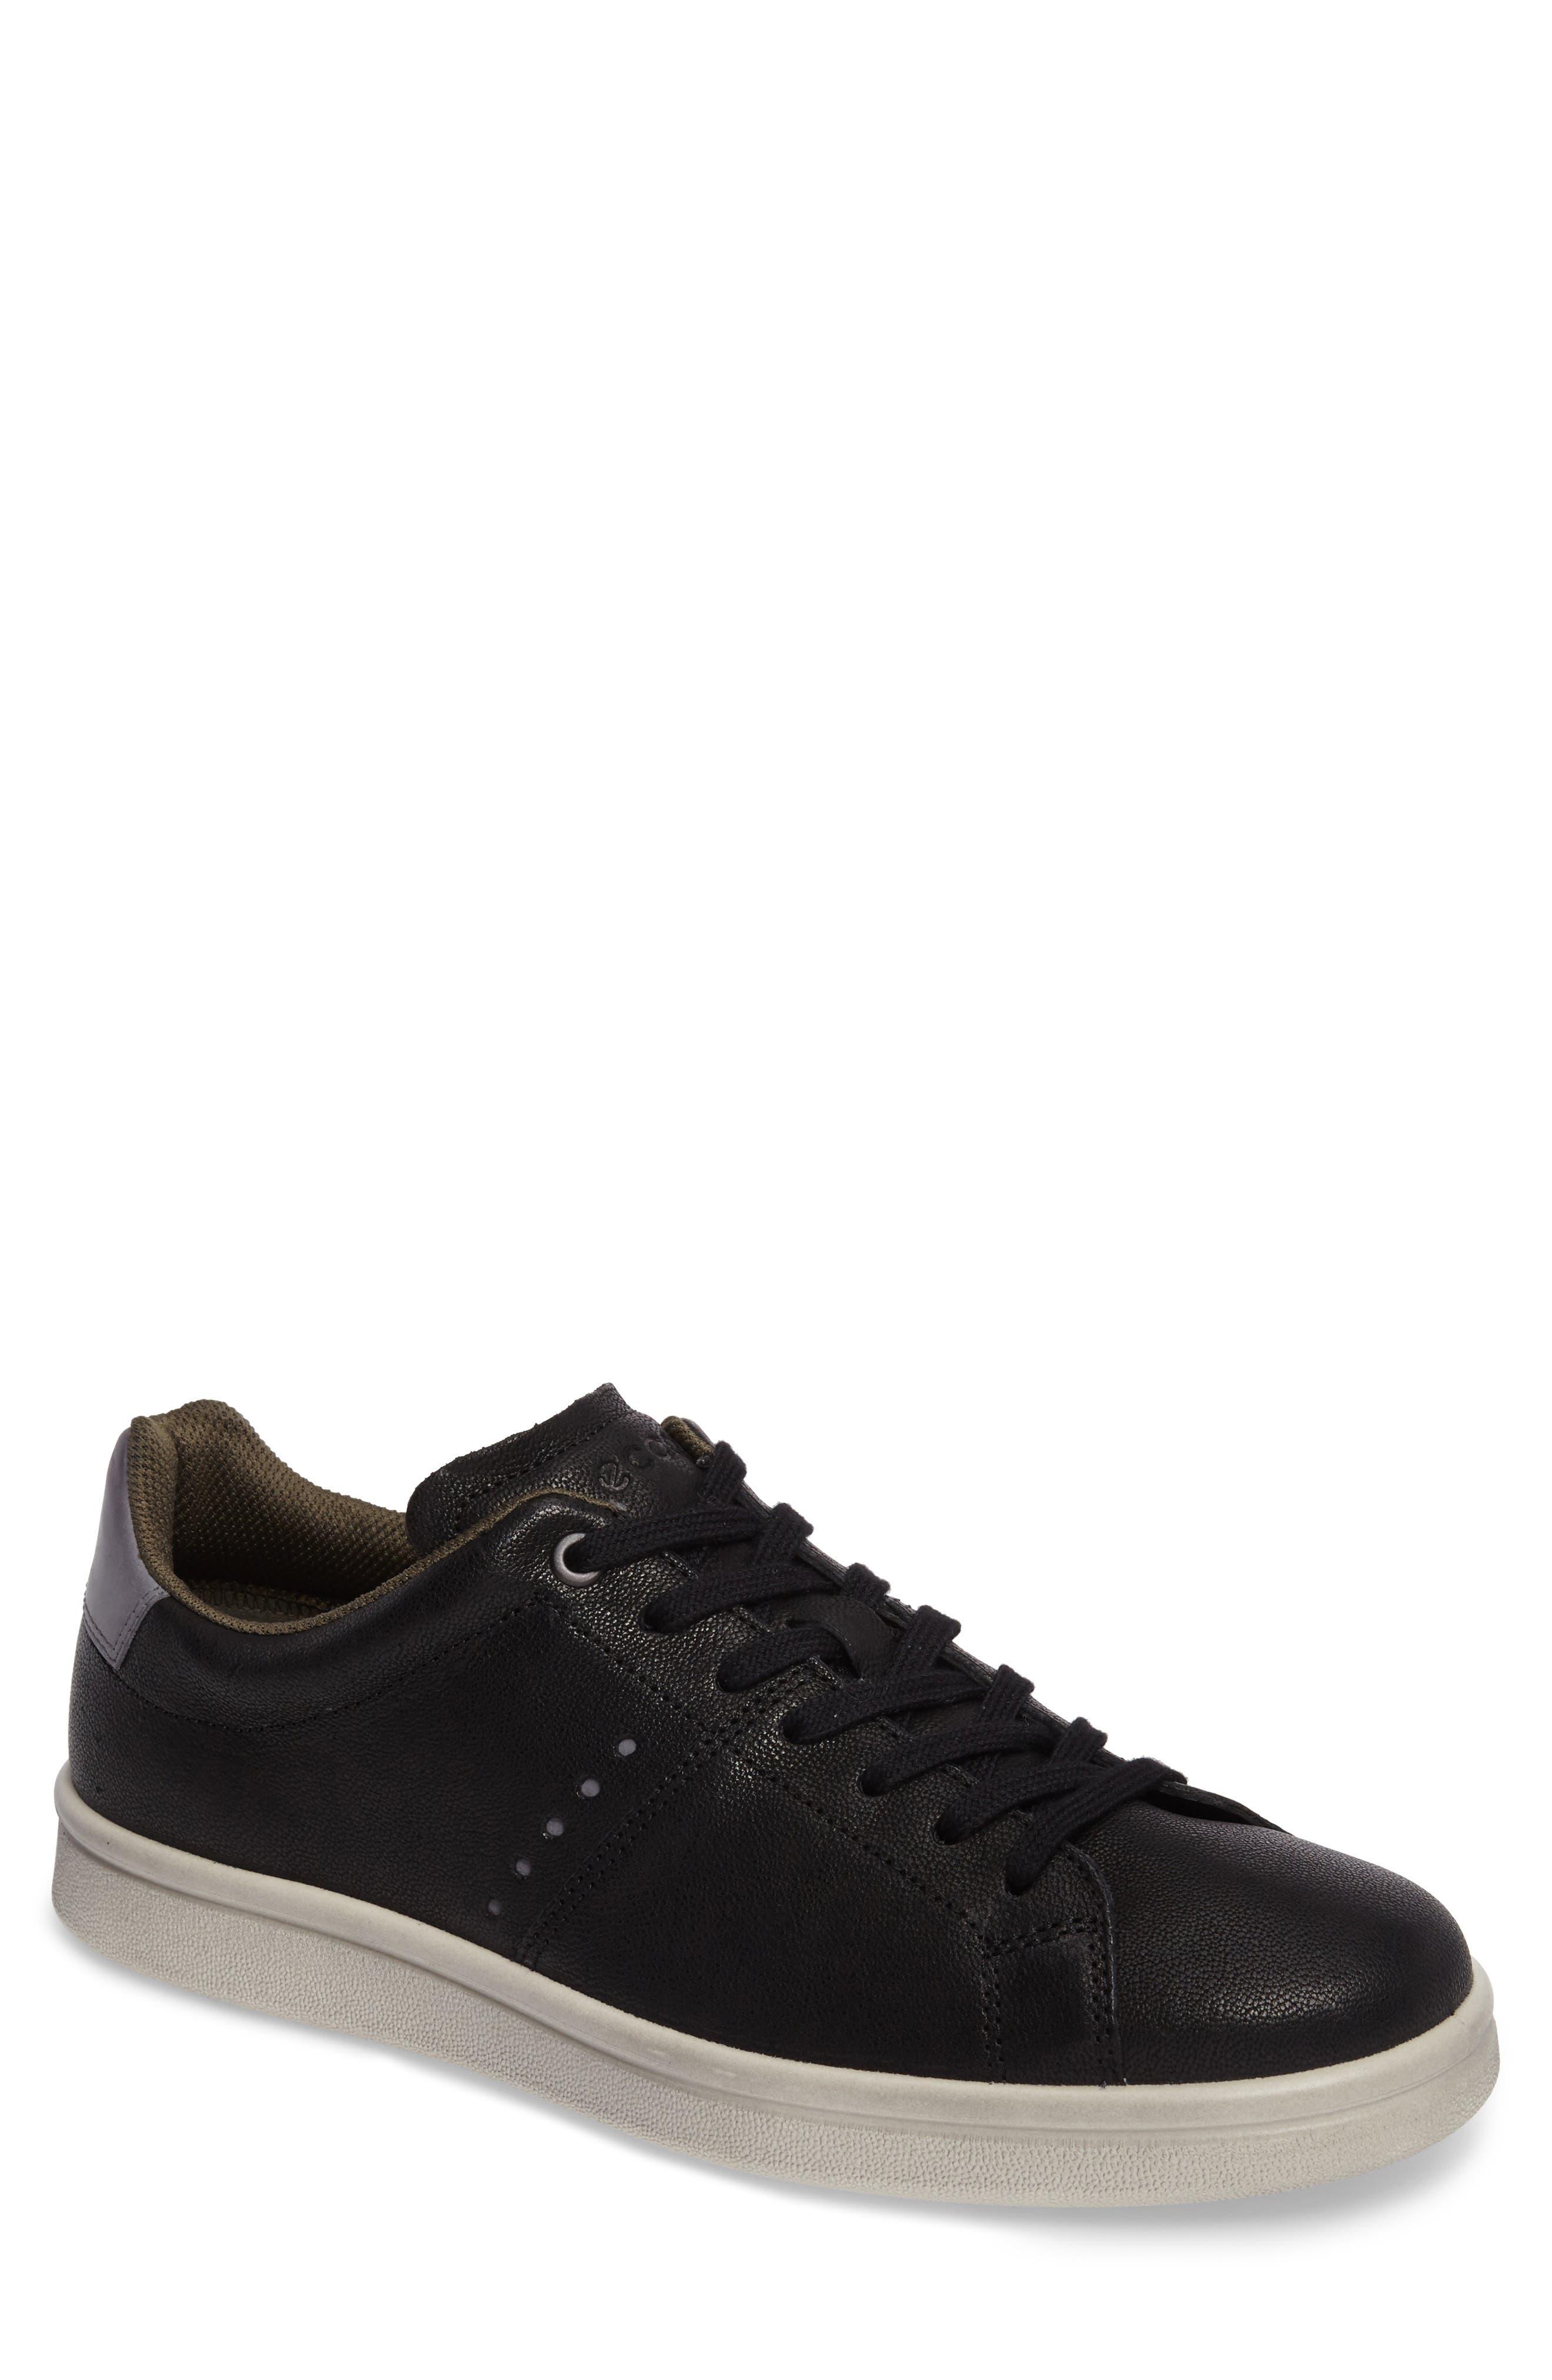 Alternate Image 1 Selected - ECCO Kallum Sneaker (Men)